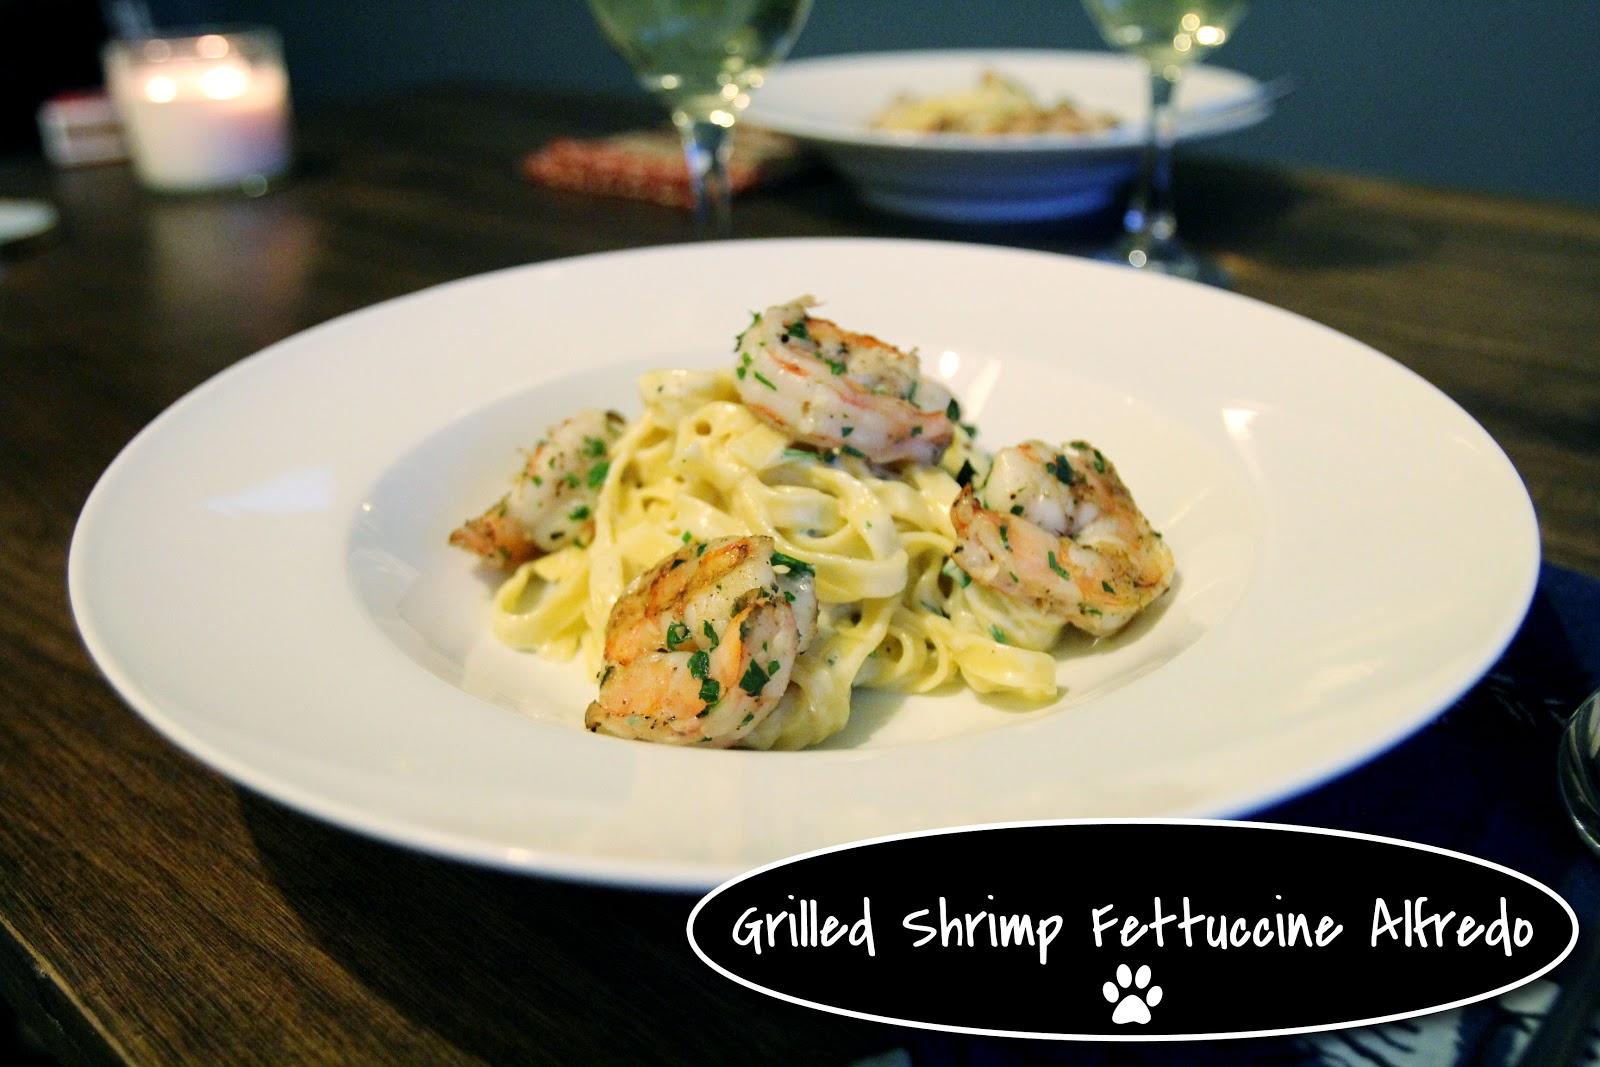 Fettuccine Alfredo with Grilled Shrimp